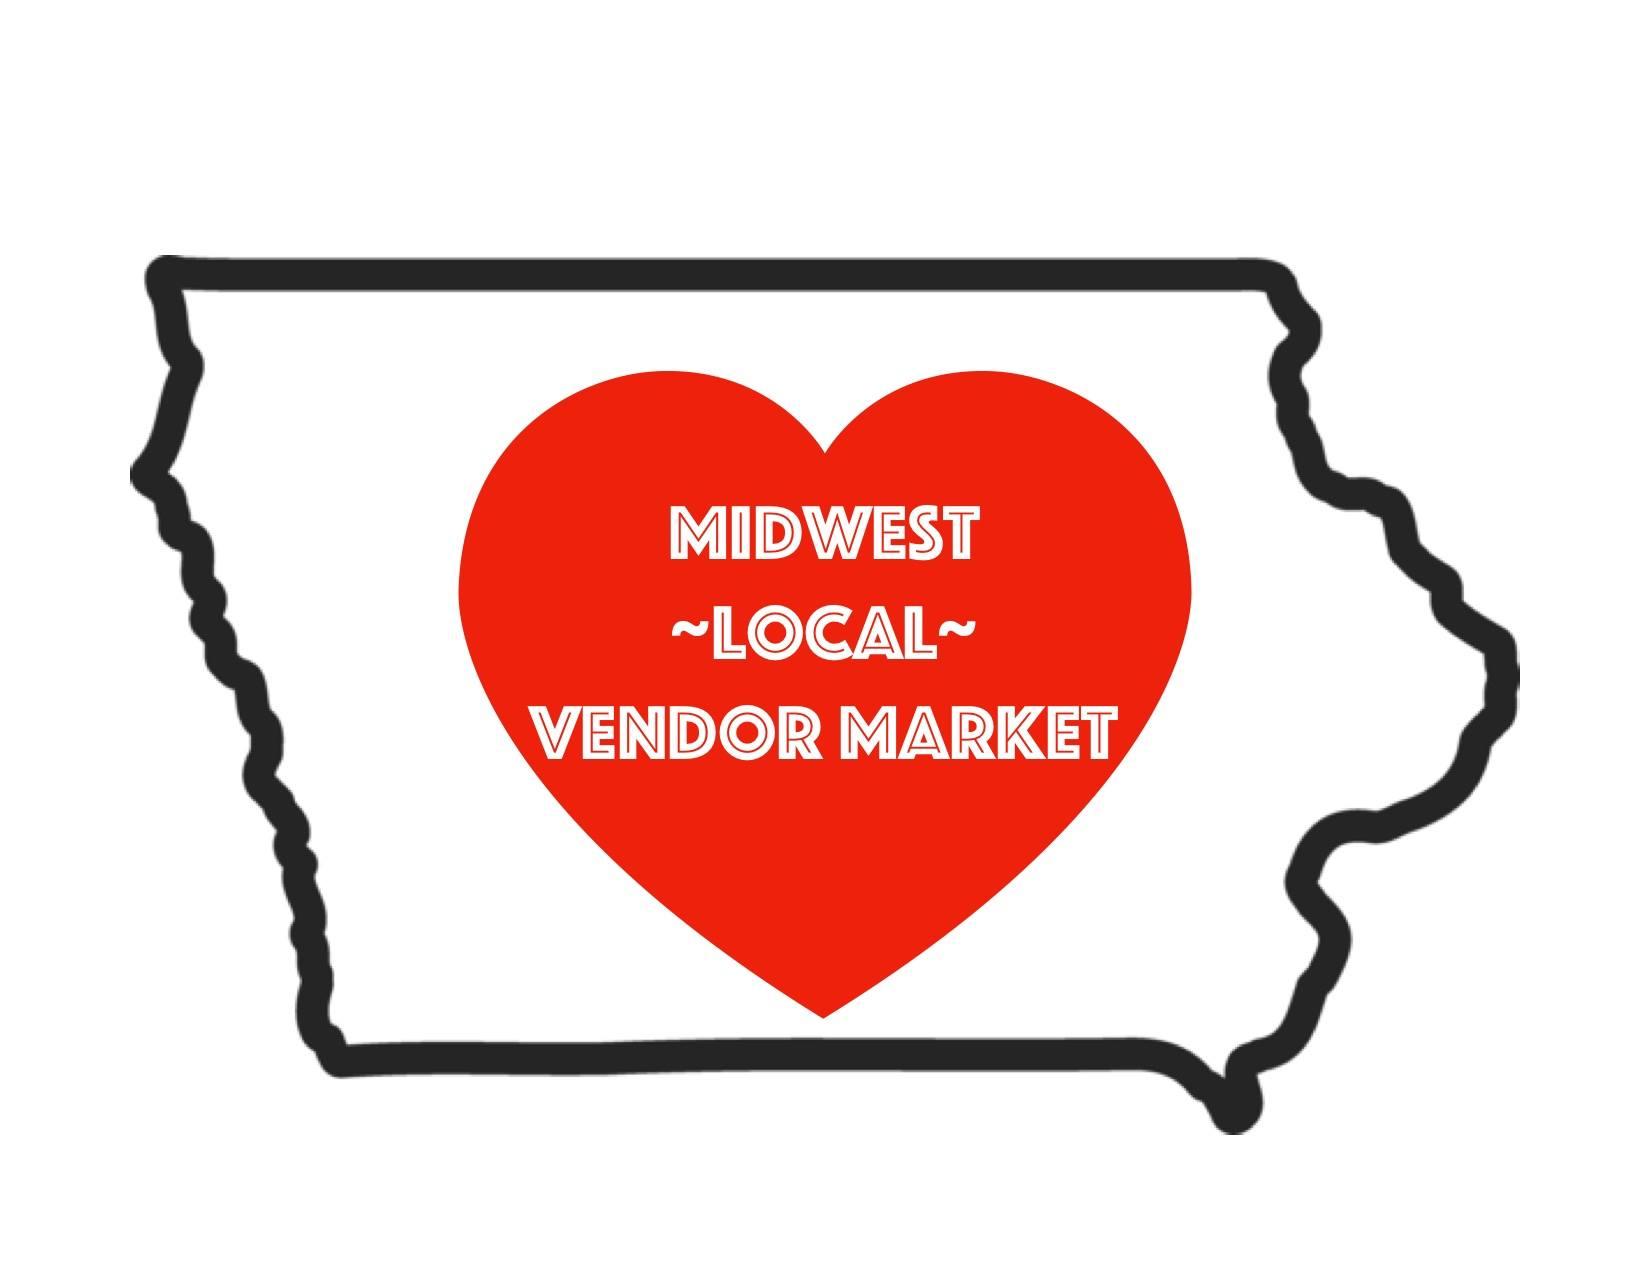 midwest local vendor market